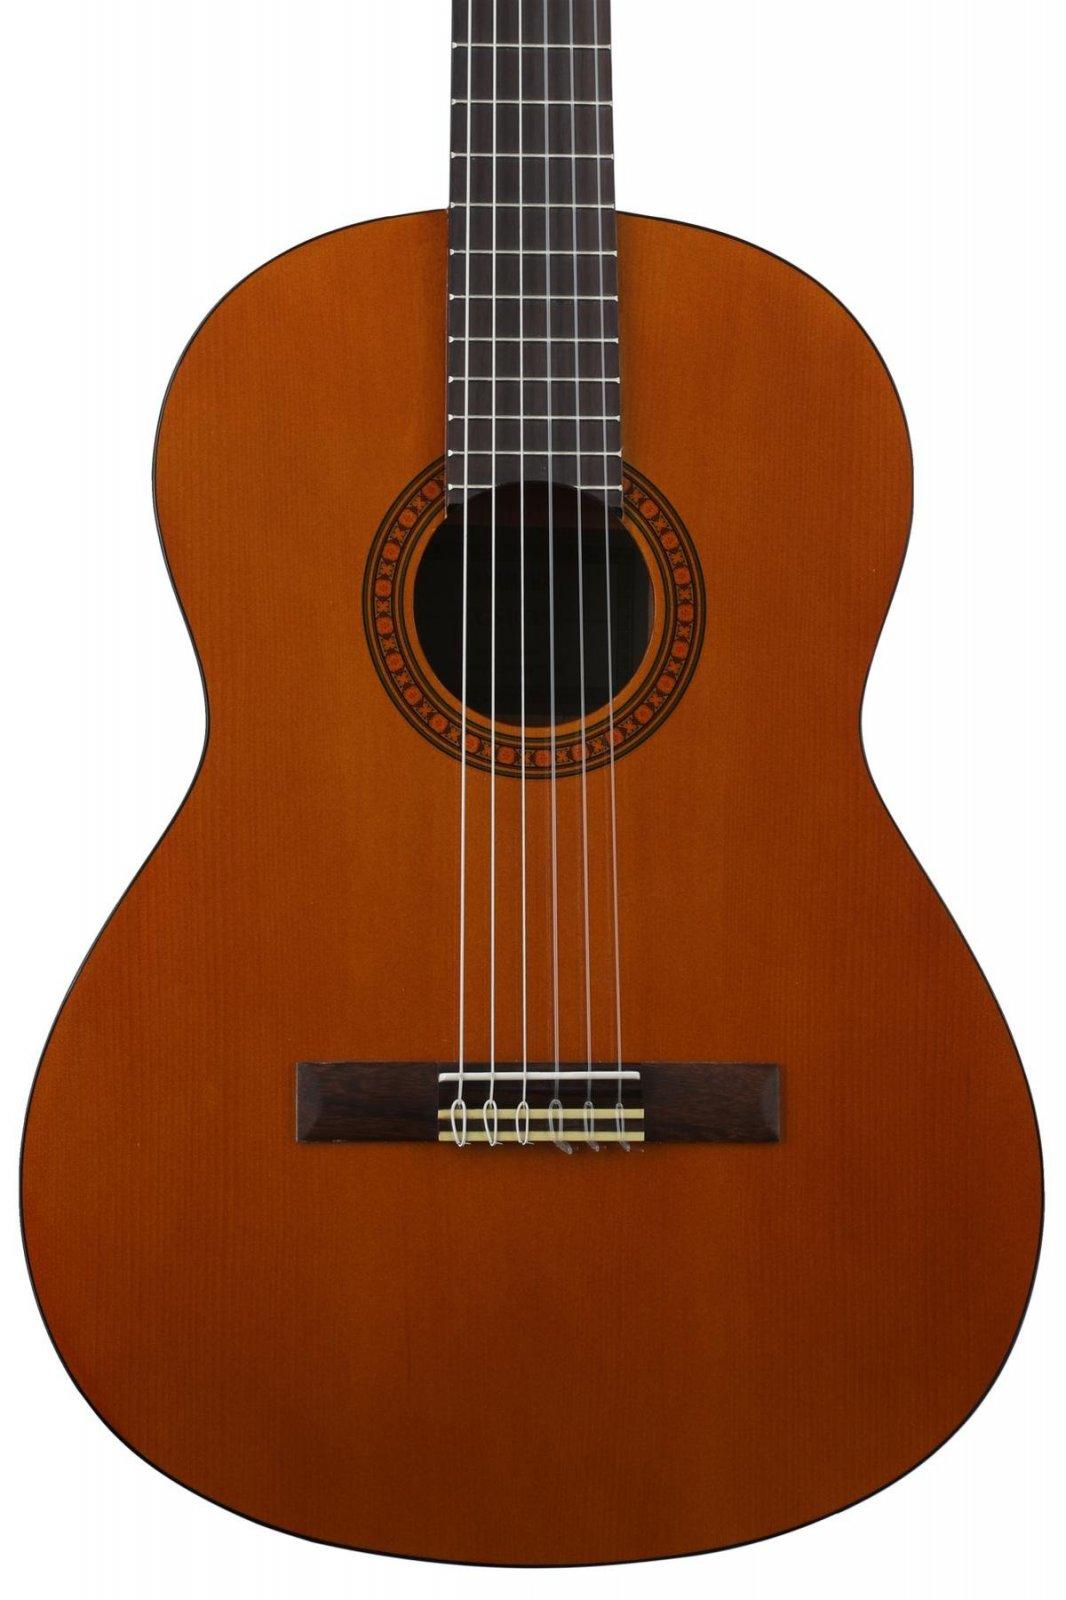 Yamaha CGS103a 3/4 Size Classical